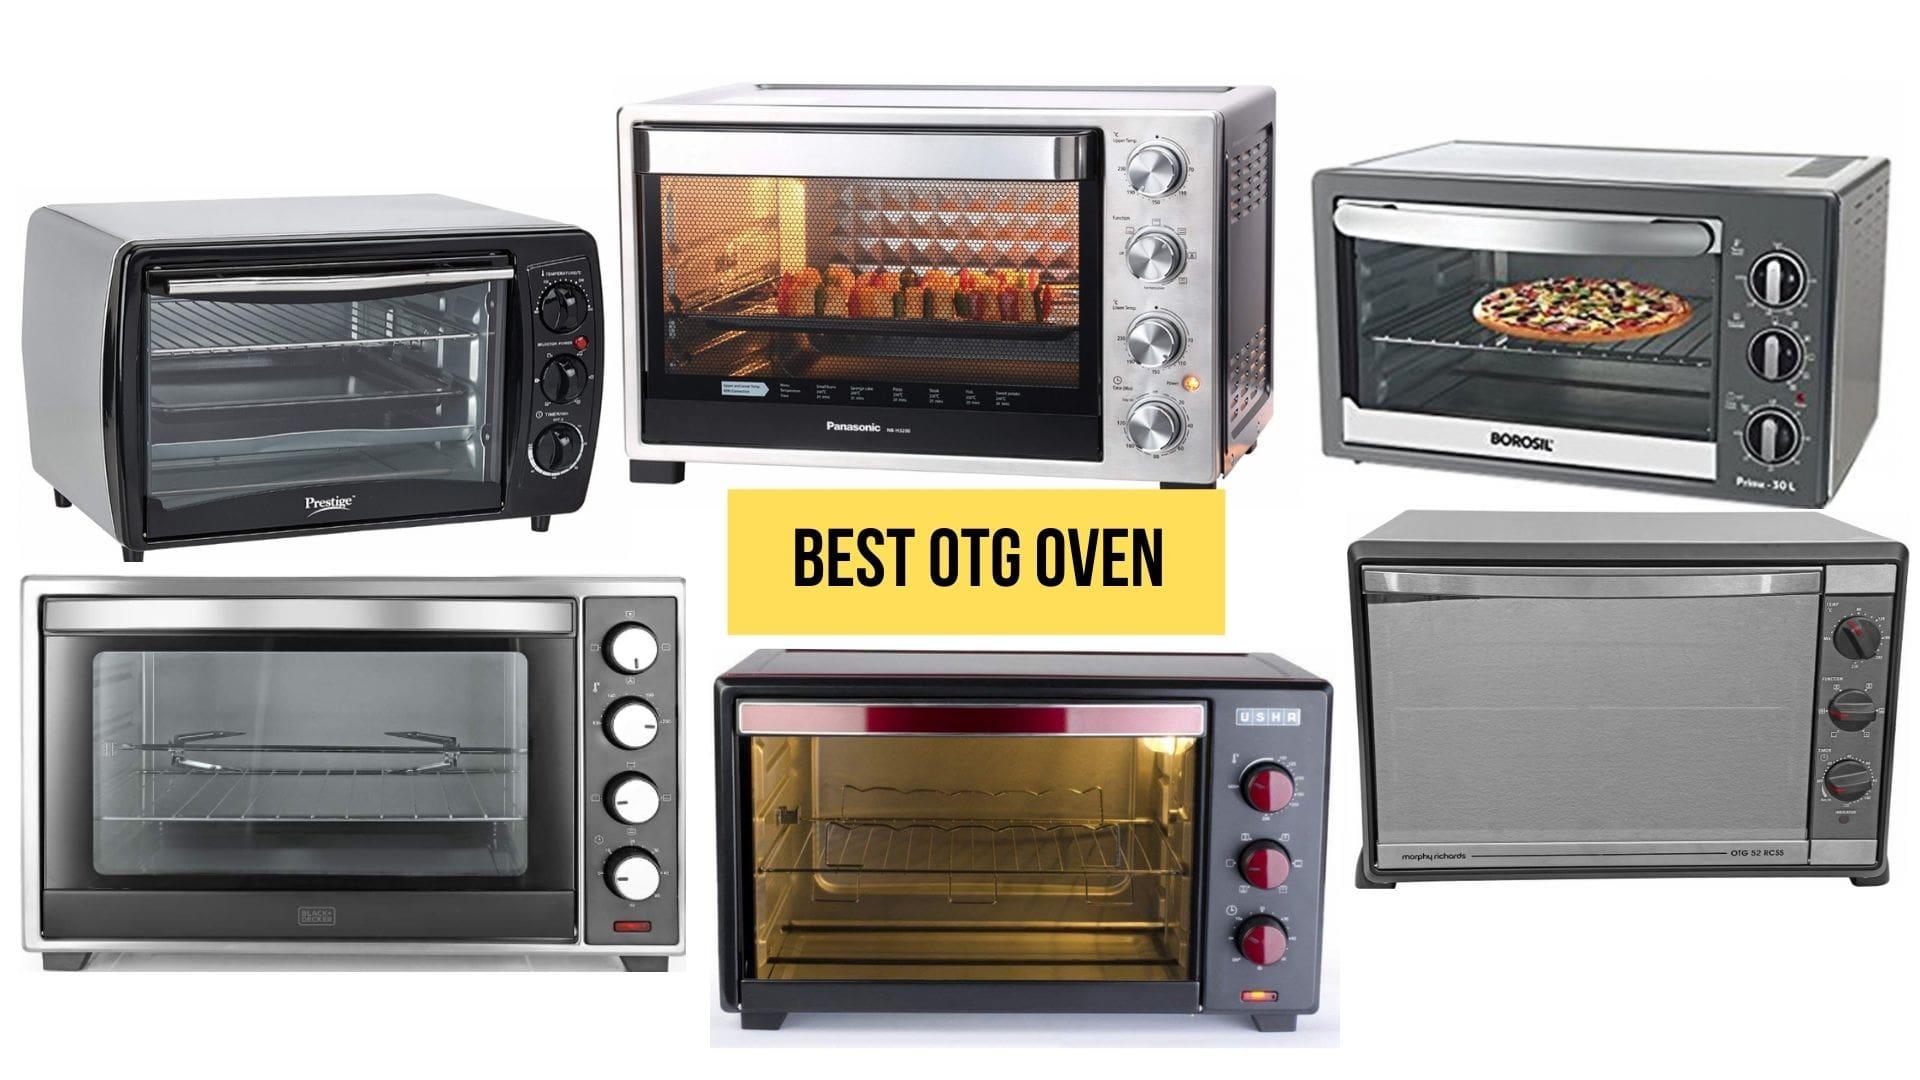 Best OTG Oven: Guide To Buy The Best OTG OVen